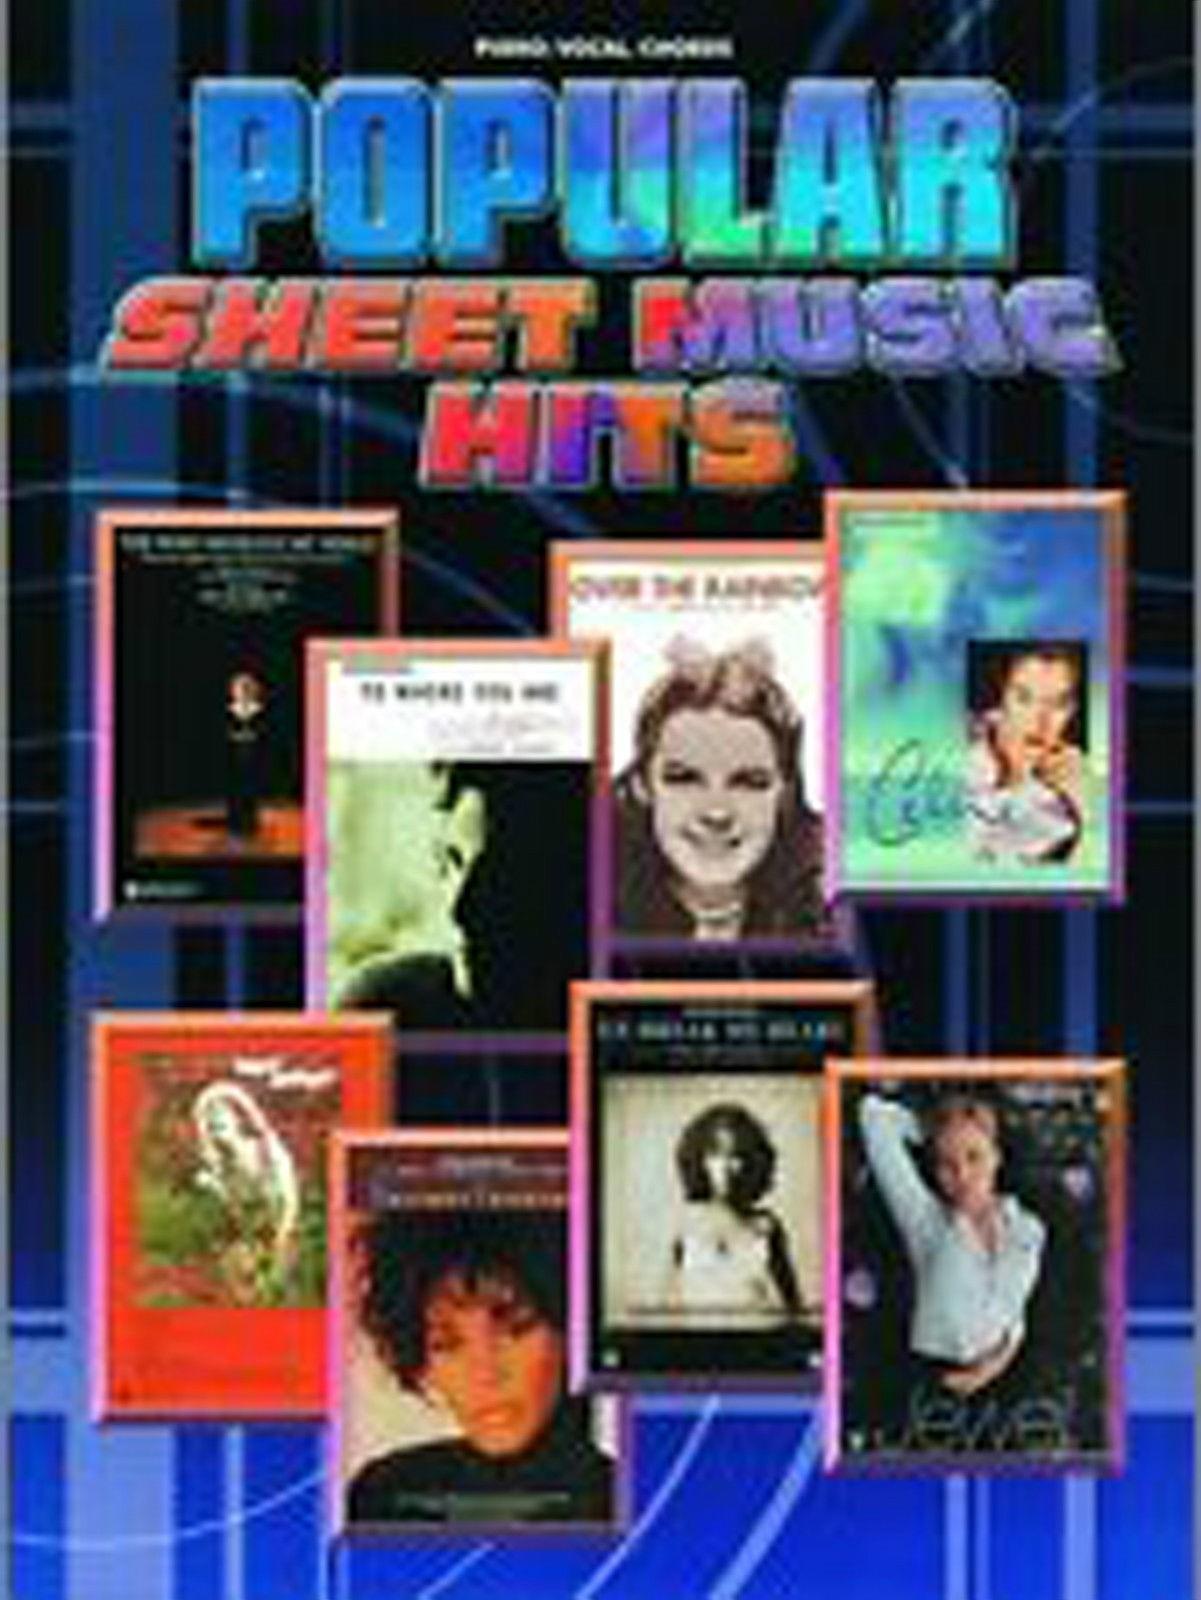 Popular Sheet Music Hits Piano Vocal Chords Book B39